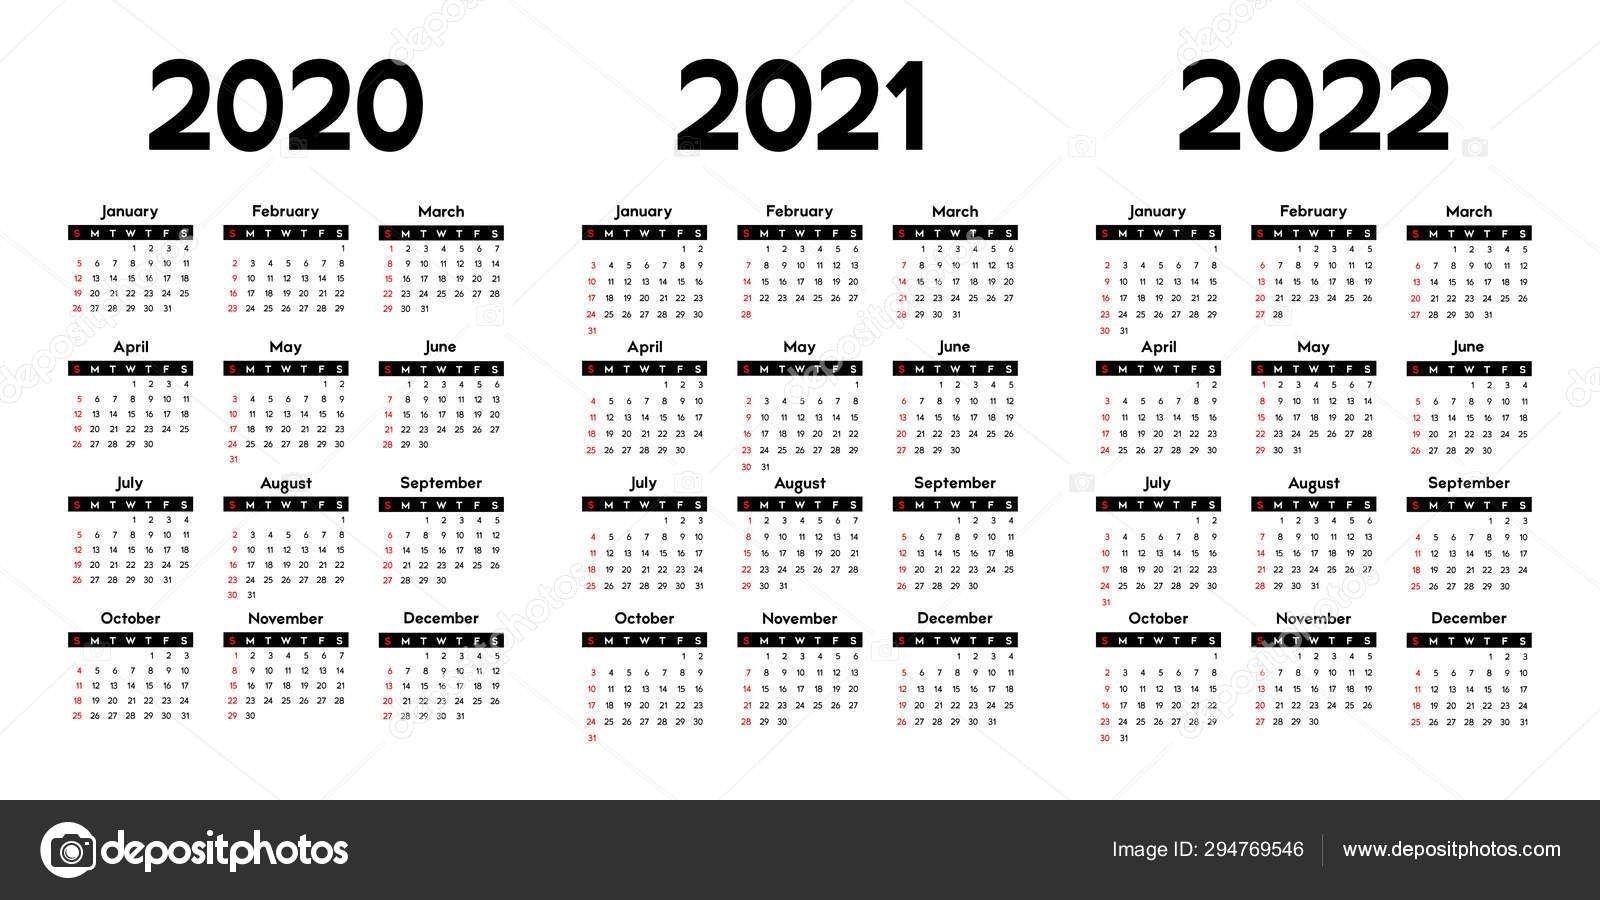 3 Year Calendars 2021 2022 2023 Free Printable | Calendar